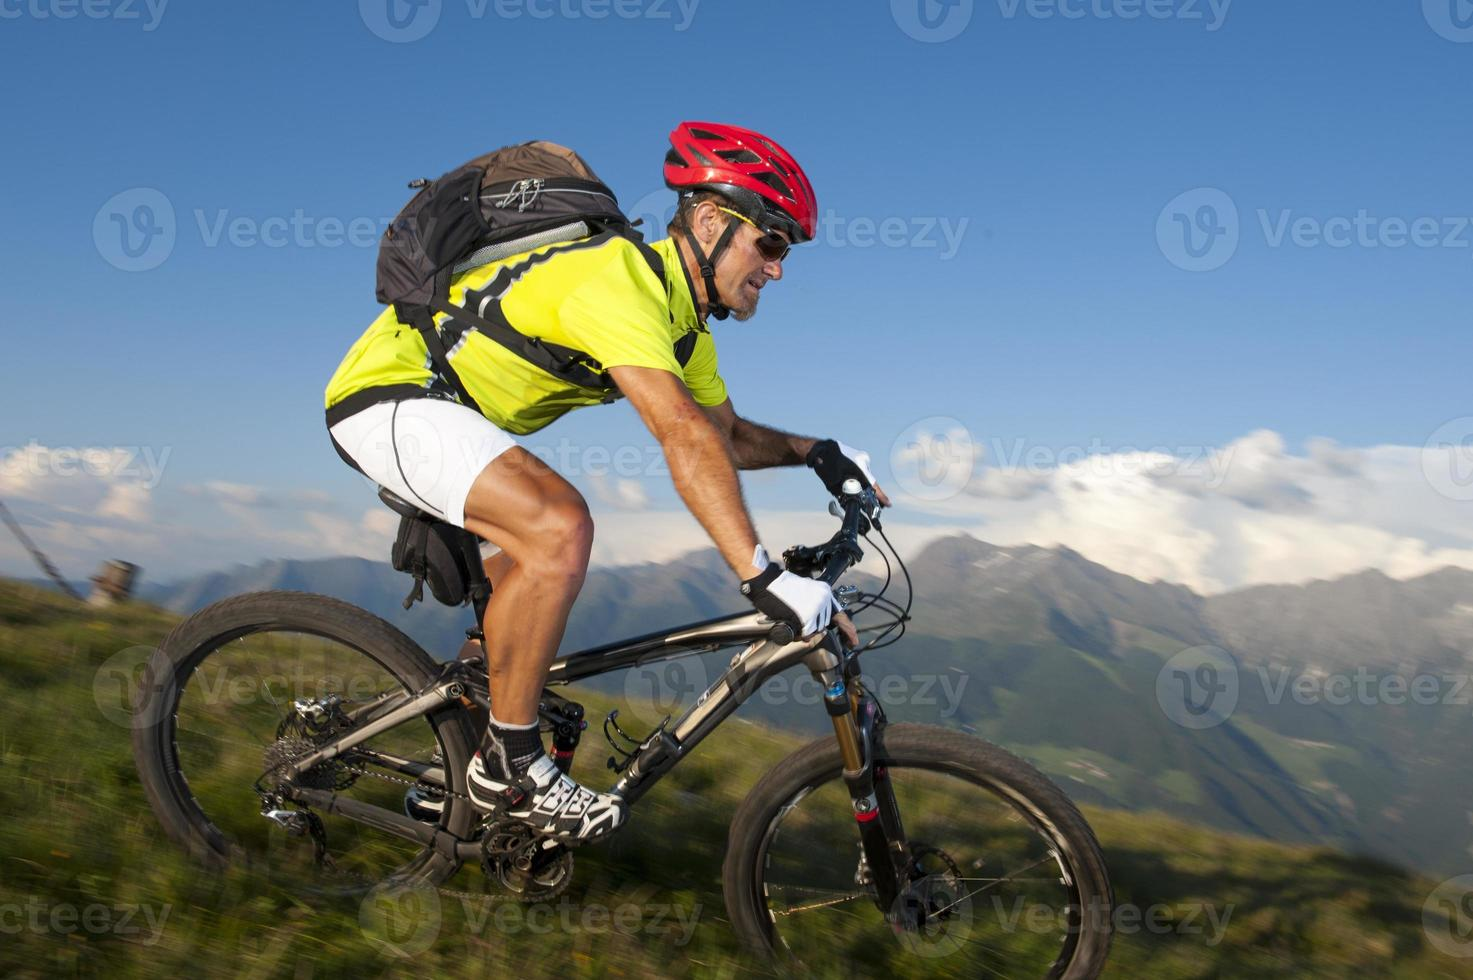 suddig mountainbike nedförsbacke foto